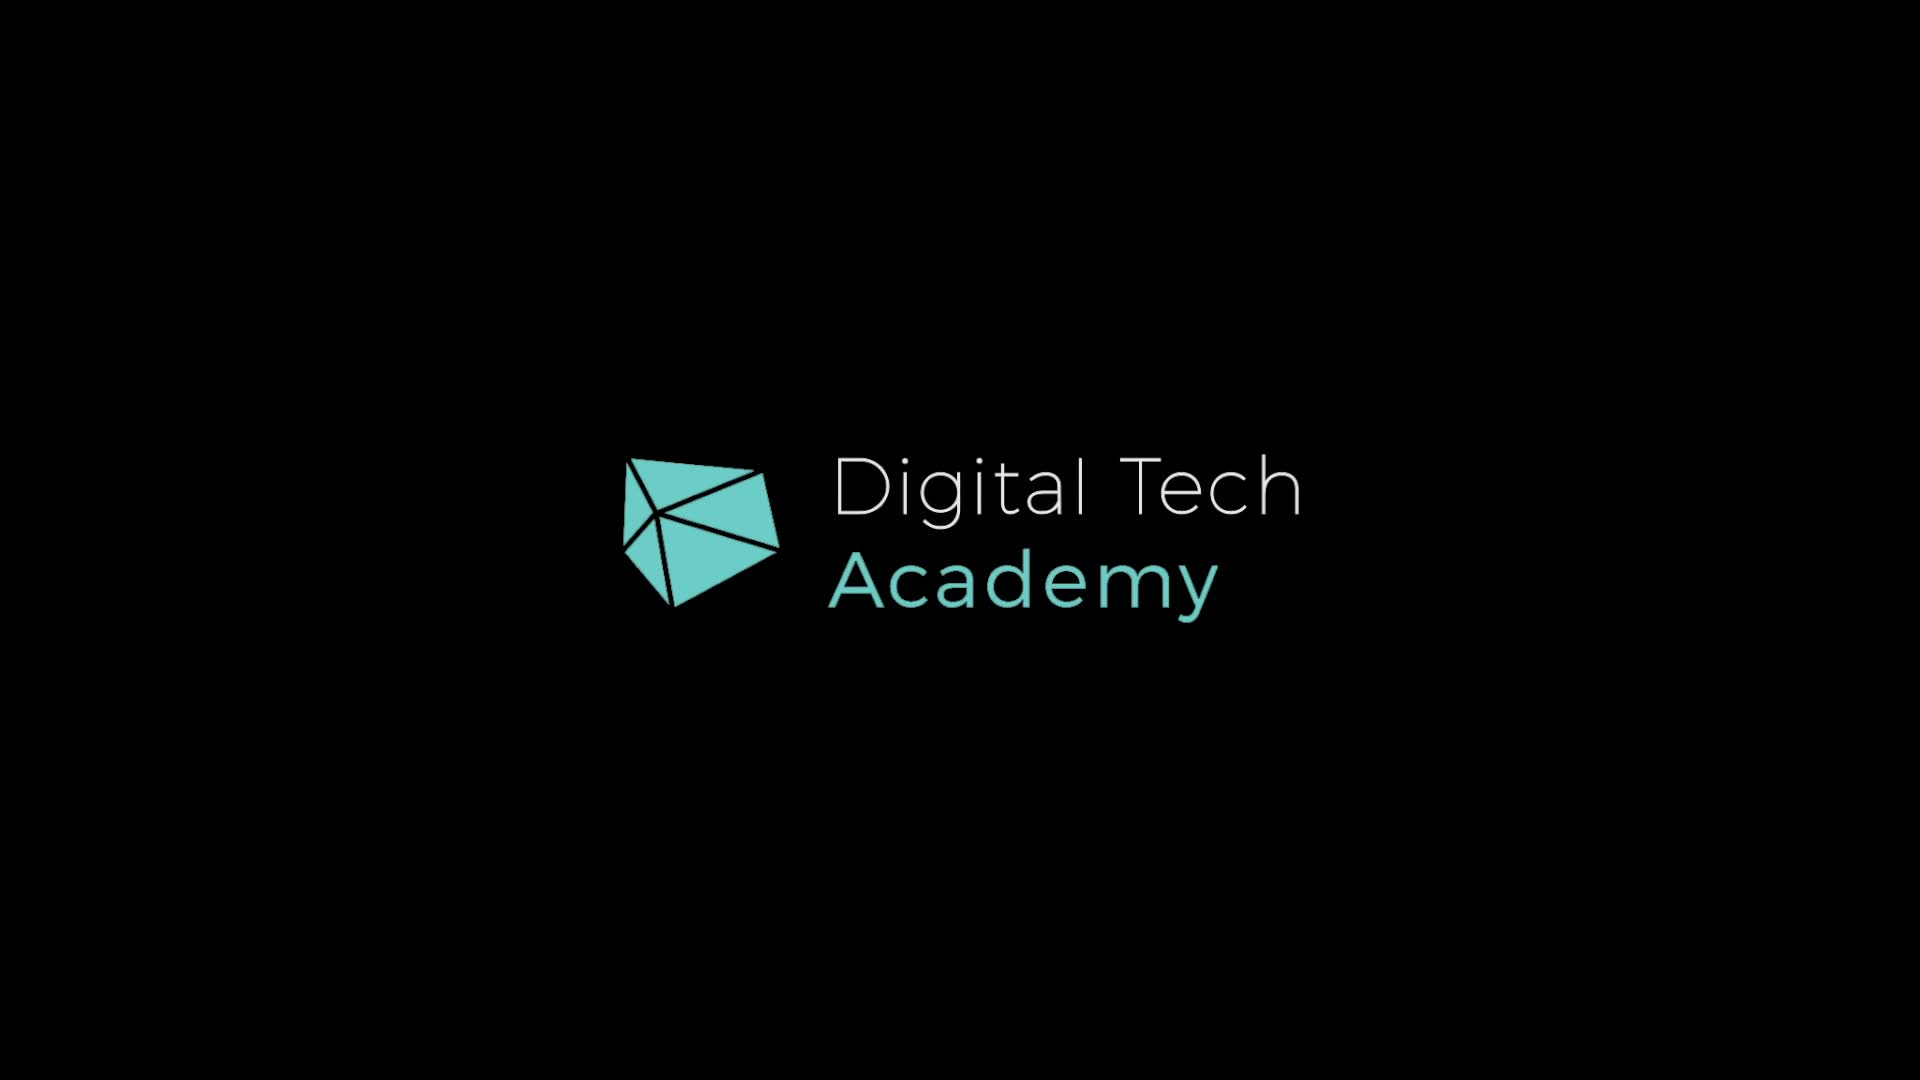 FAU – Digital Tech Fellows Program Image preview image